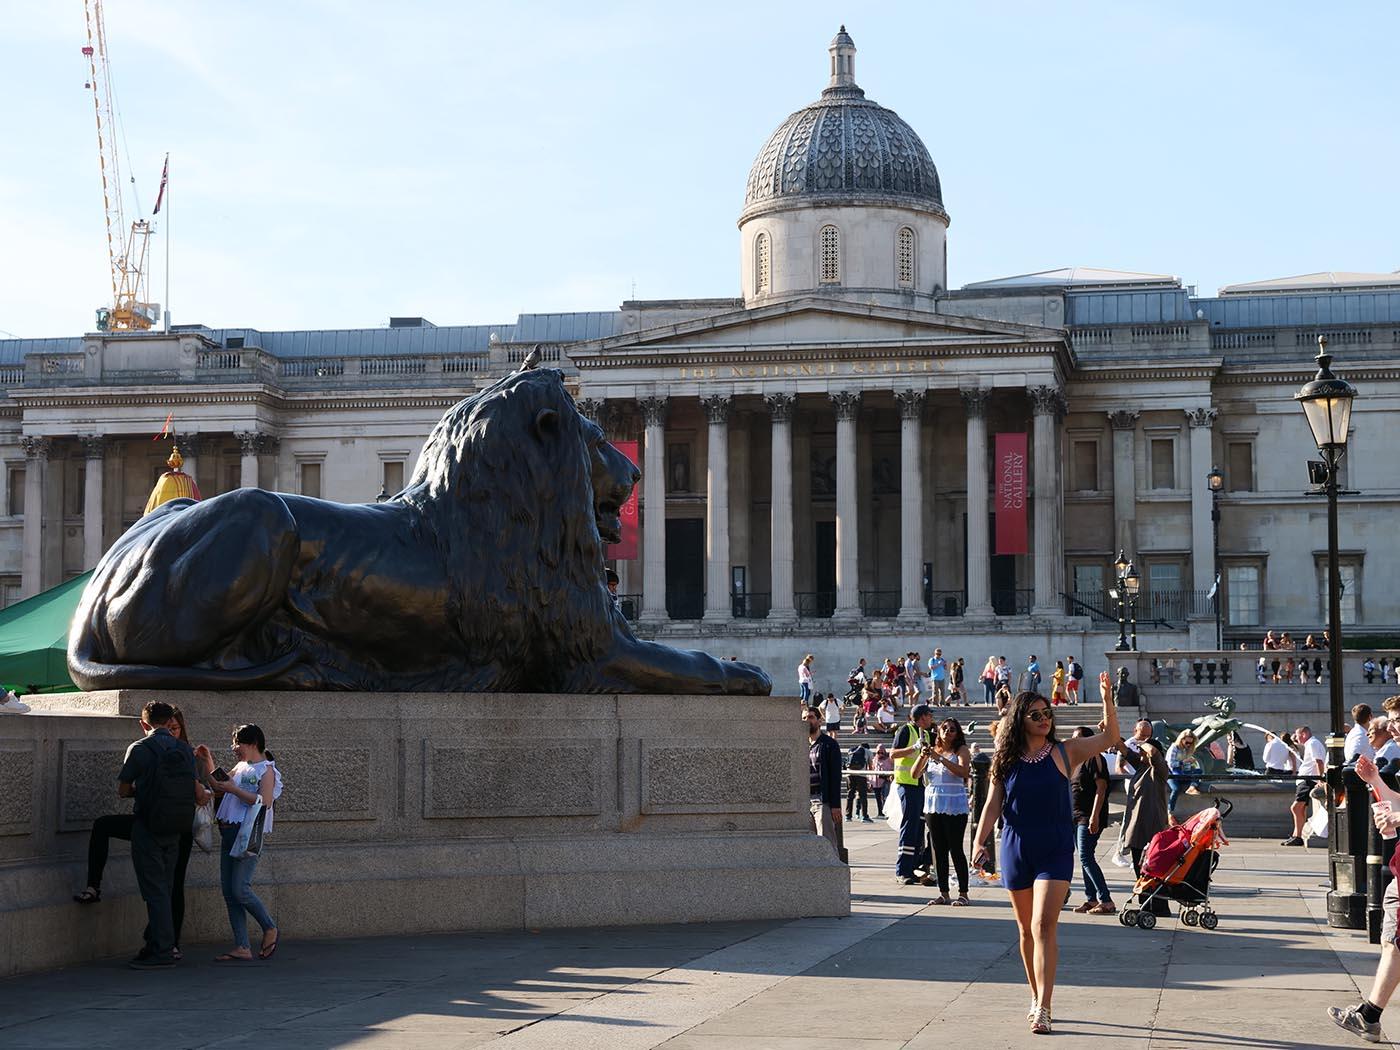 Londres Trafalgar Square National Gallery